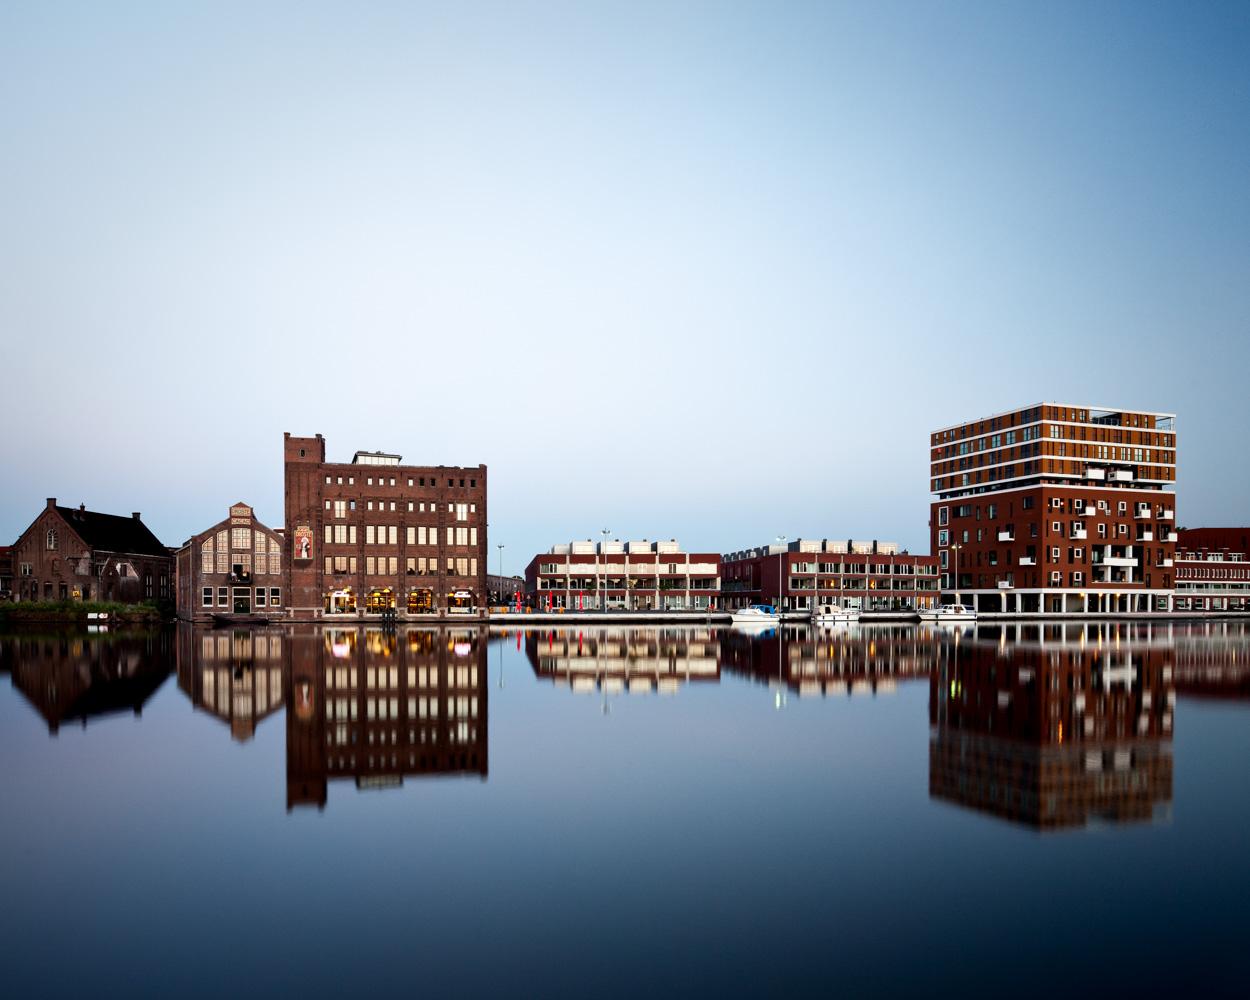 Drostefabriek Haarlem